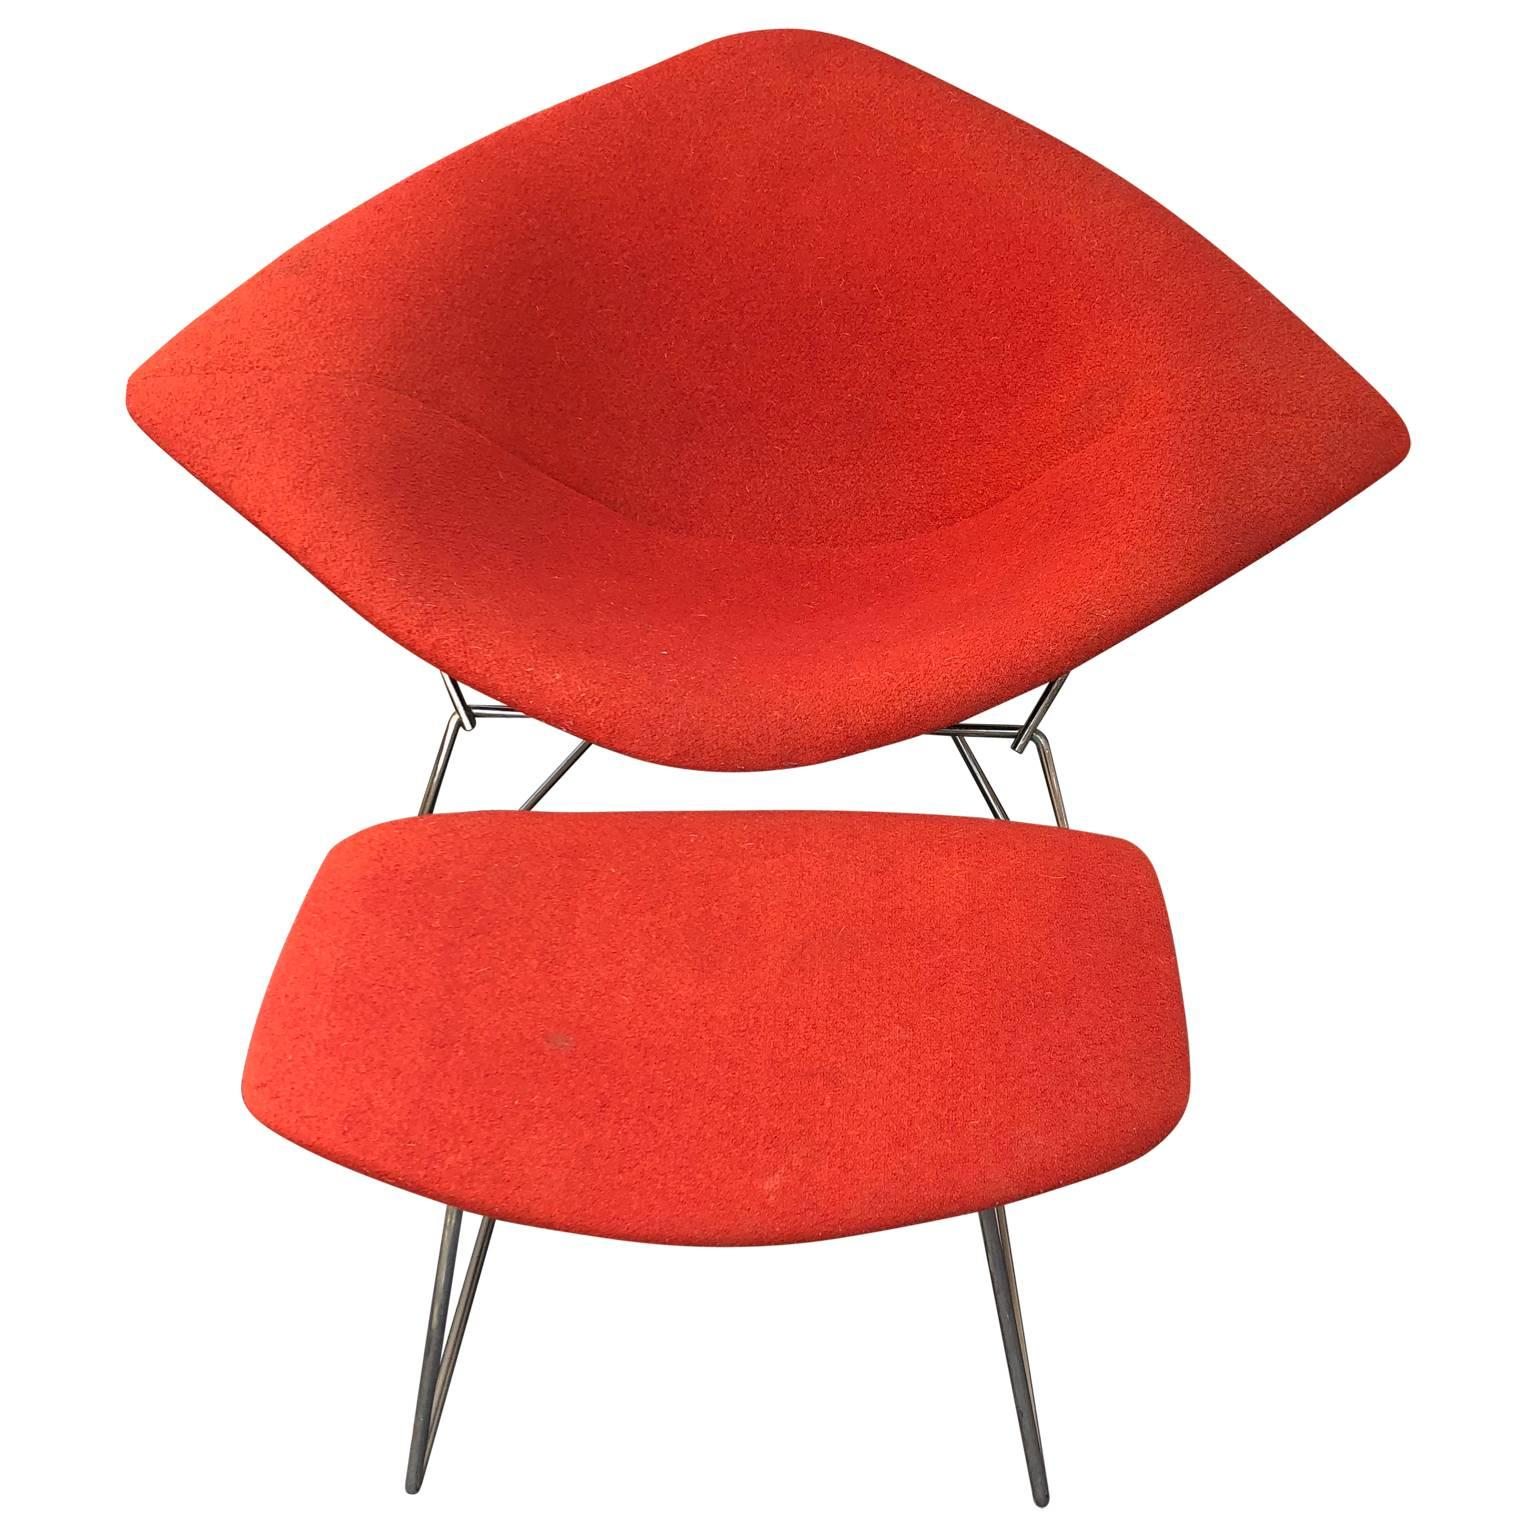 Chromed Midcentury Harry Bertoia Diamond Chair And Ottoman For Knoll For  Sale